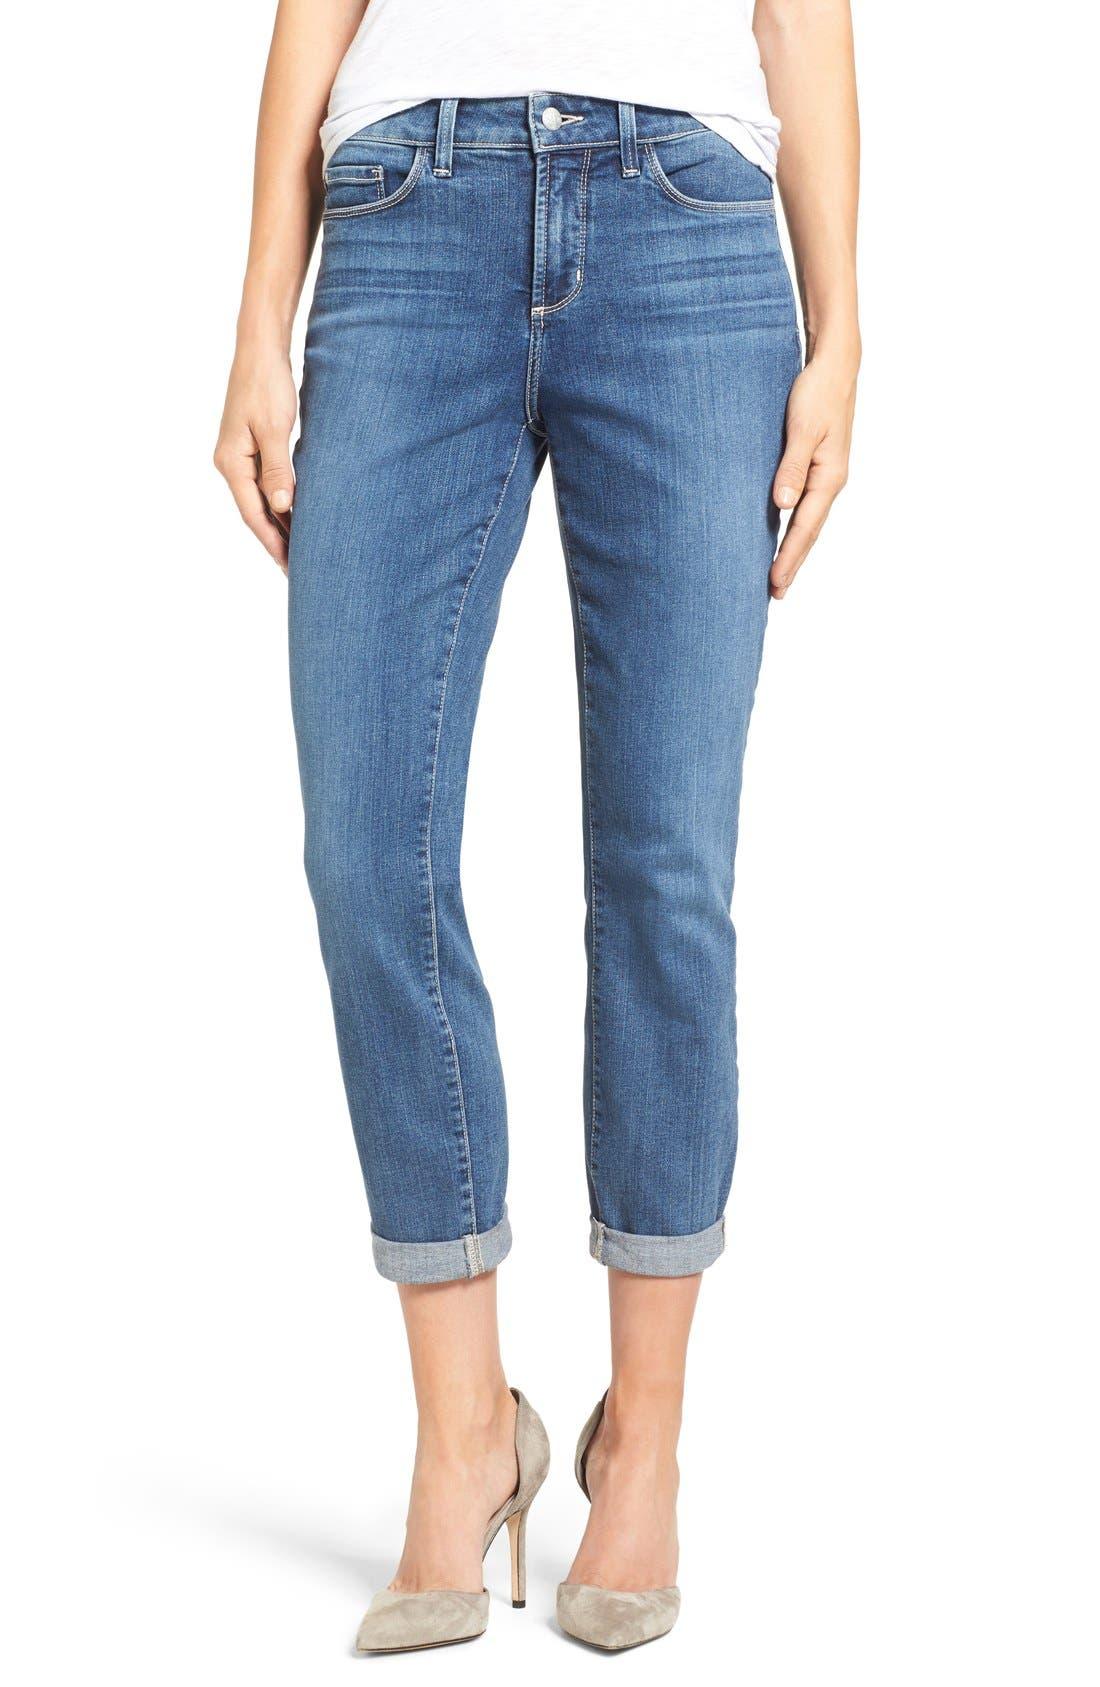 NYDJ Alina Stretch Ankle Jeans